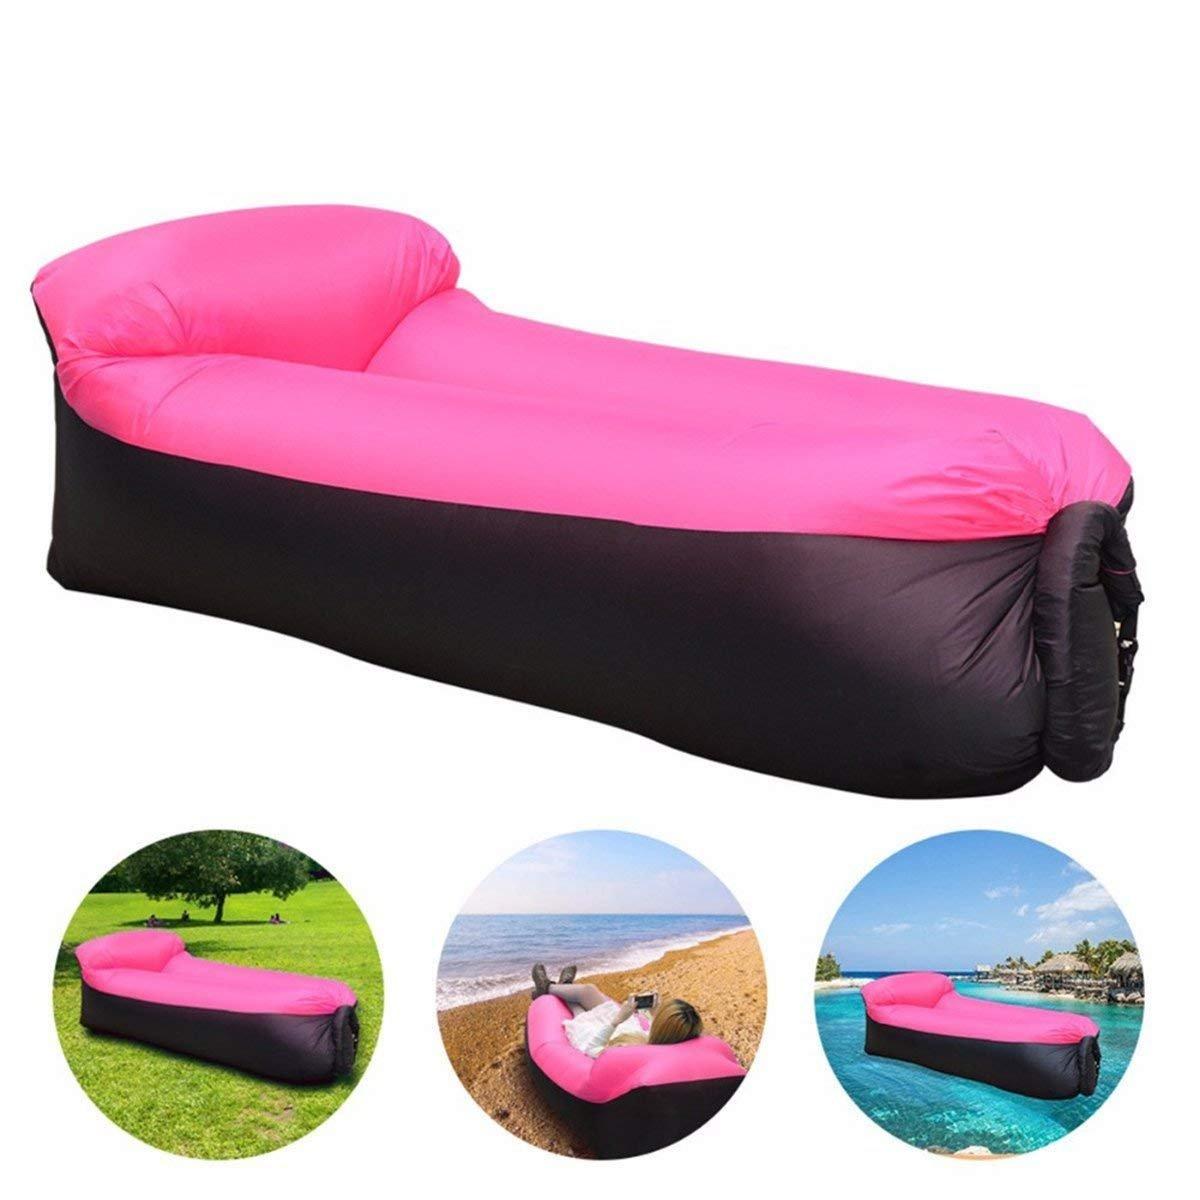 DAOXU 210T Sofa Inflable, portátil Impermeable Ligero poliéster Aire sofá Inflable ocioso, Aire Cama Tumbona de Playa para Viajes, Piscina, Camping, Parque, ...